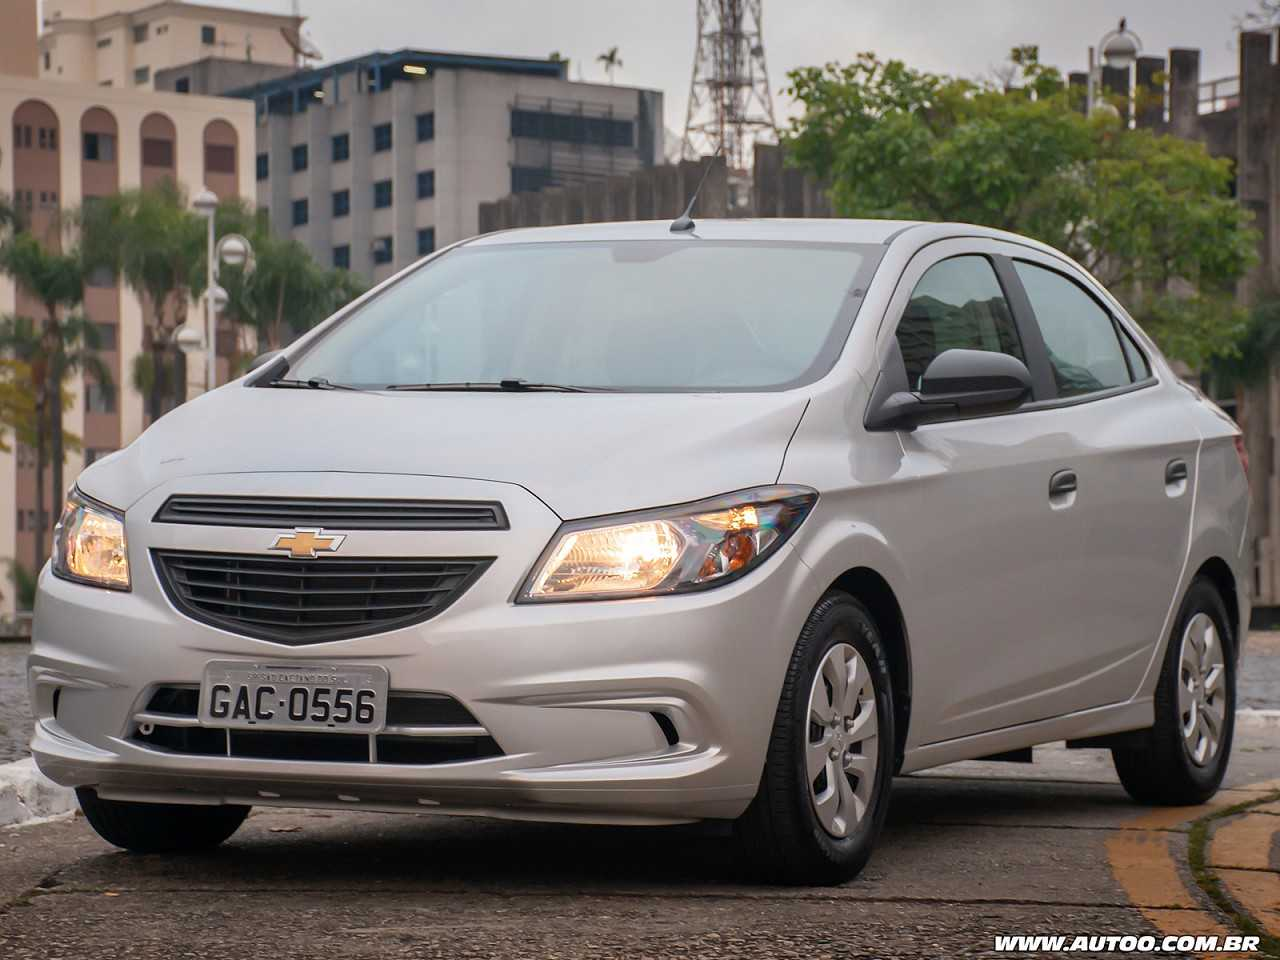 ChevroletPrisma 2019 - ângulo frontal